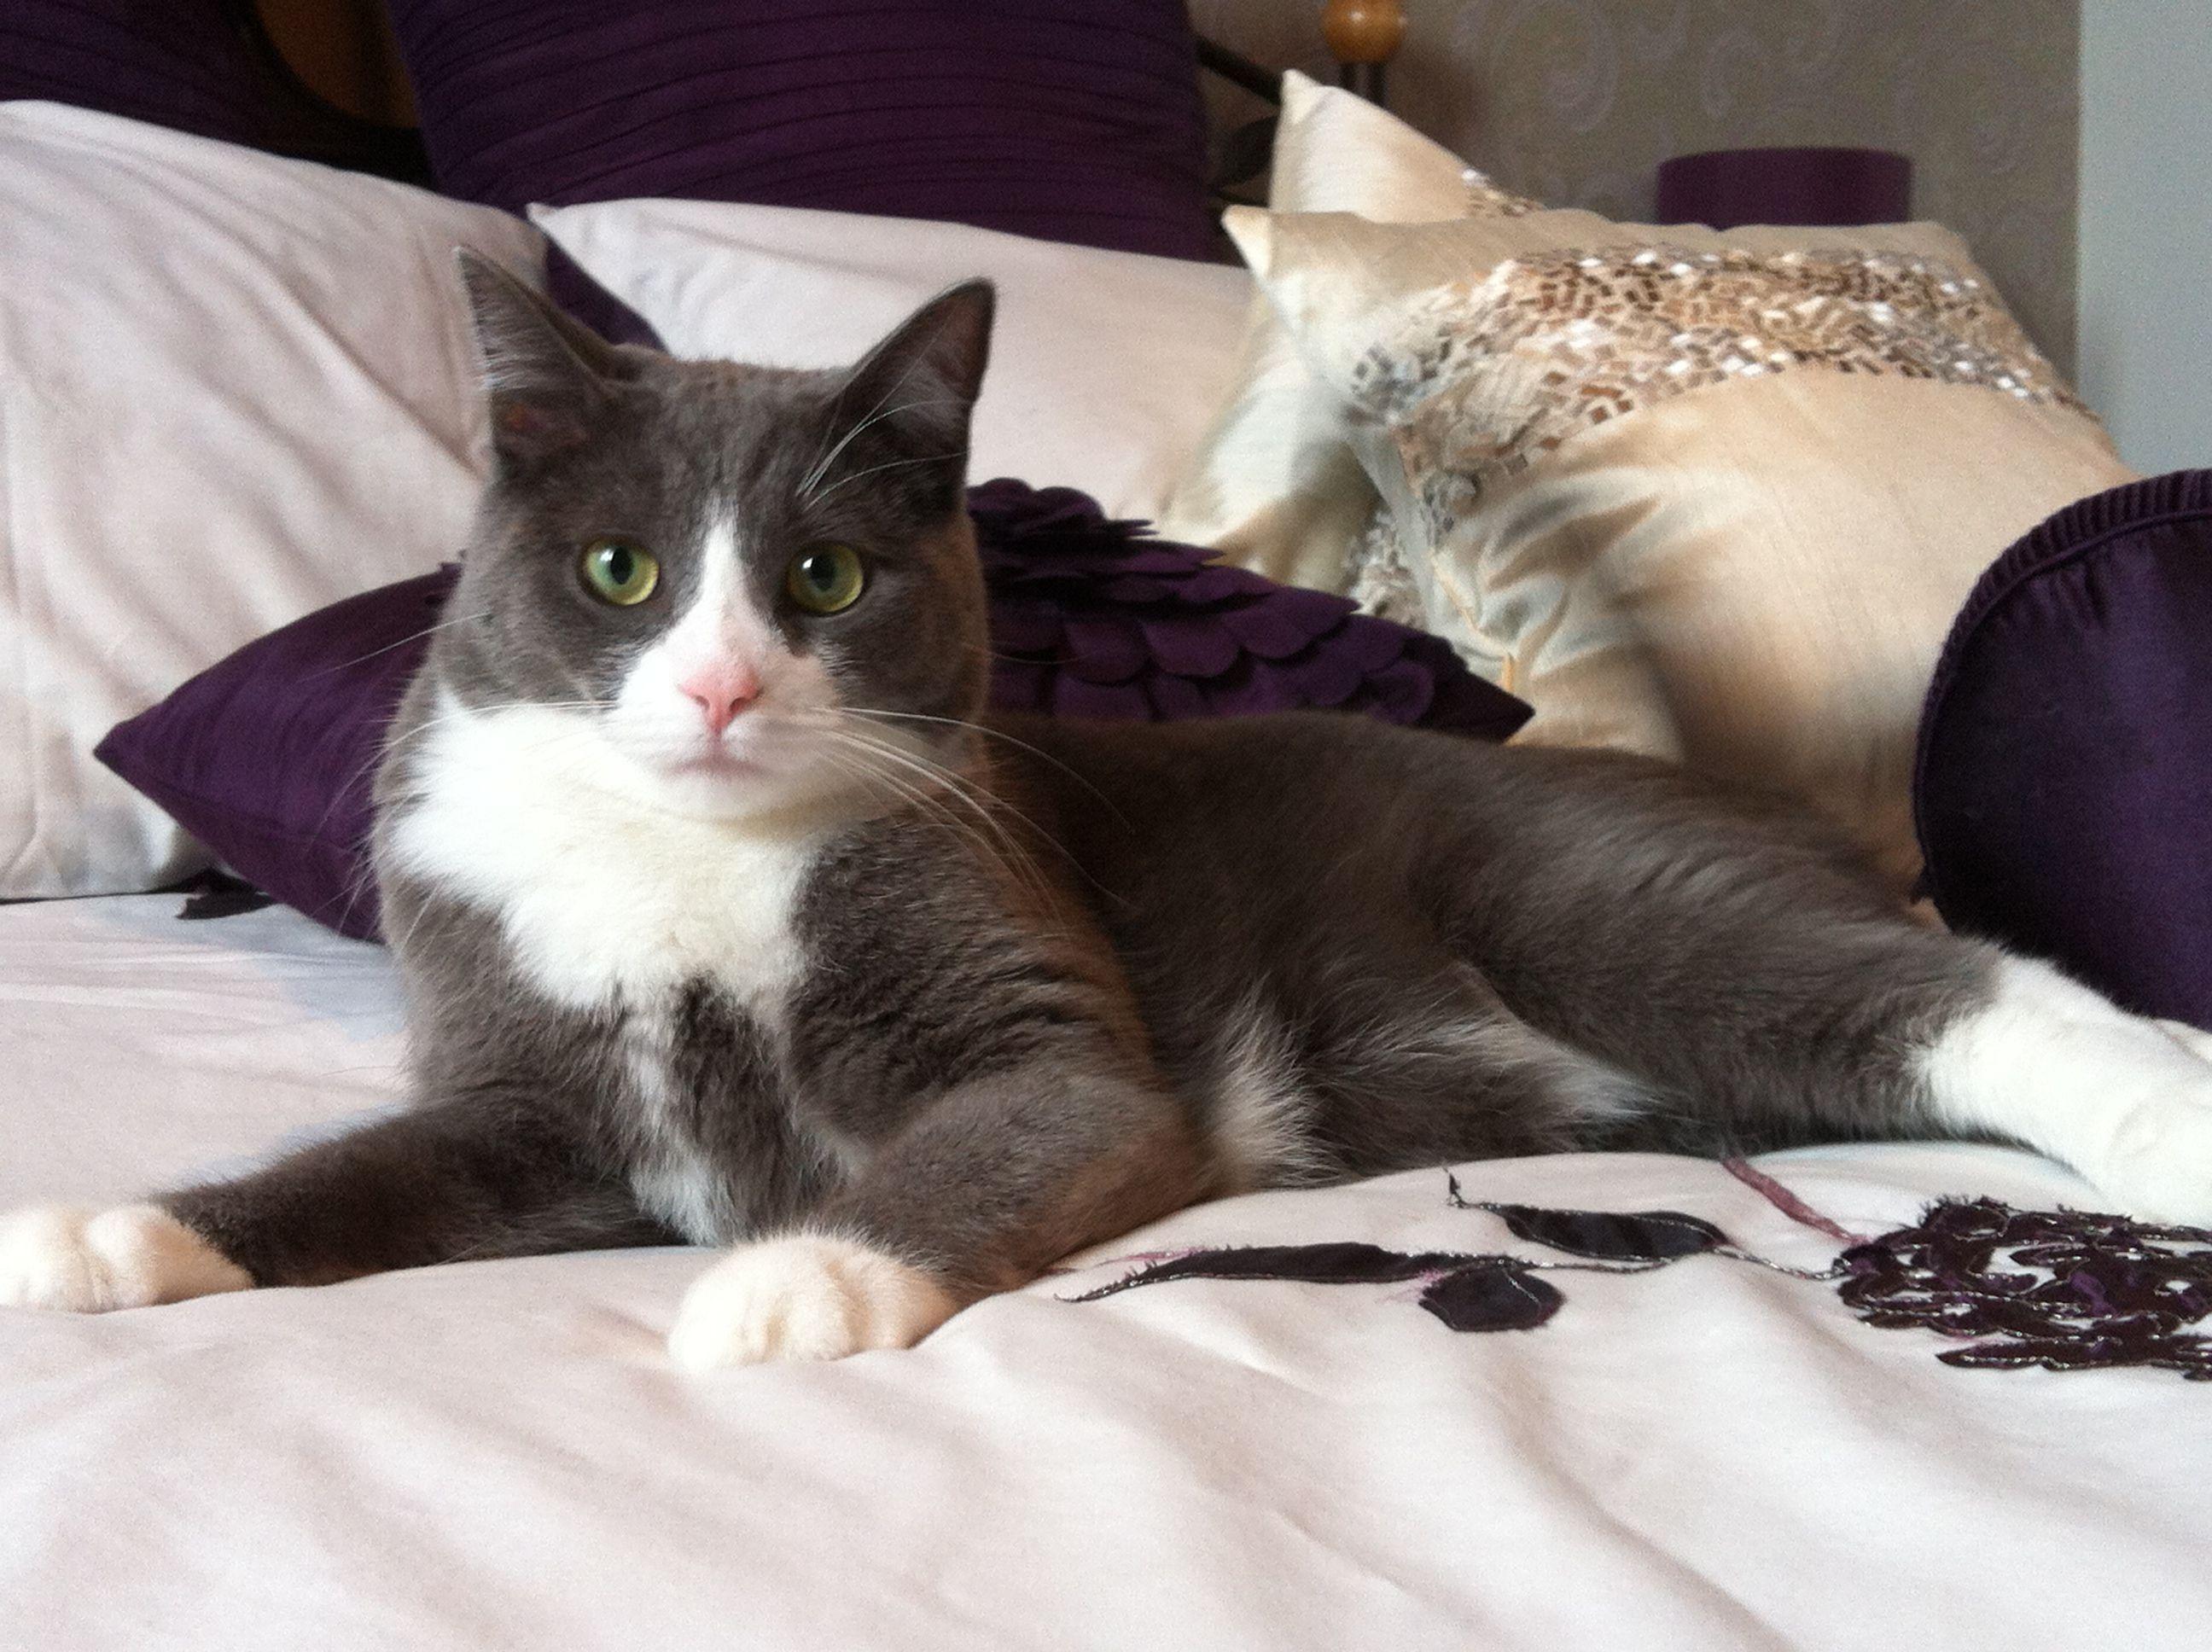 Mon chat Roméo | Cute cats, Cats, Cat s